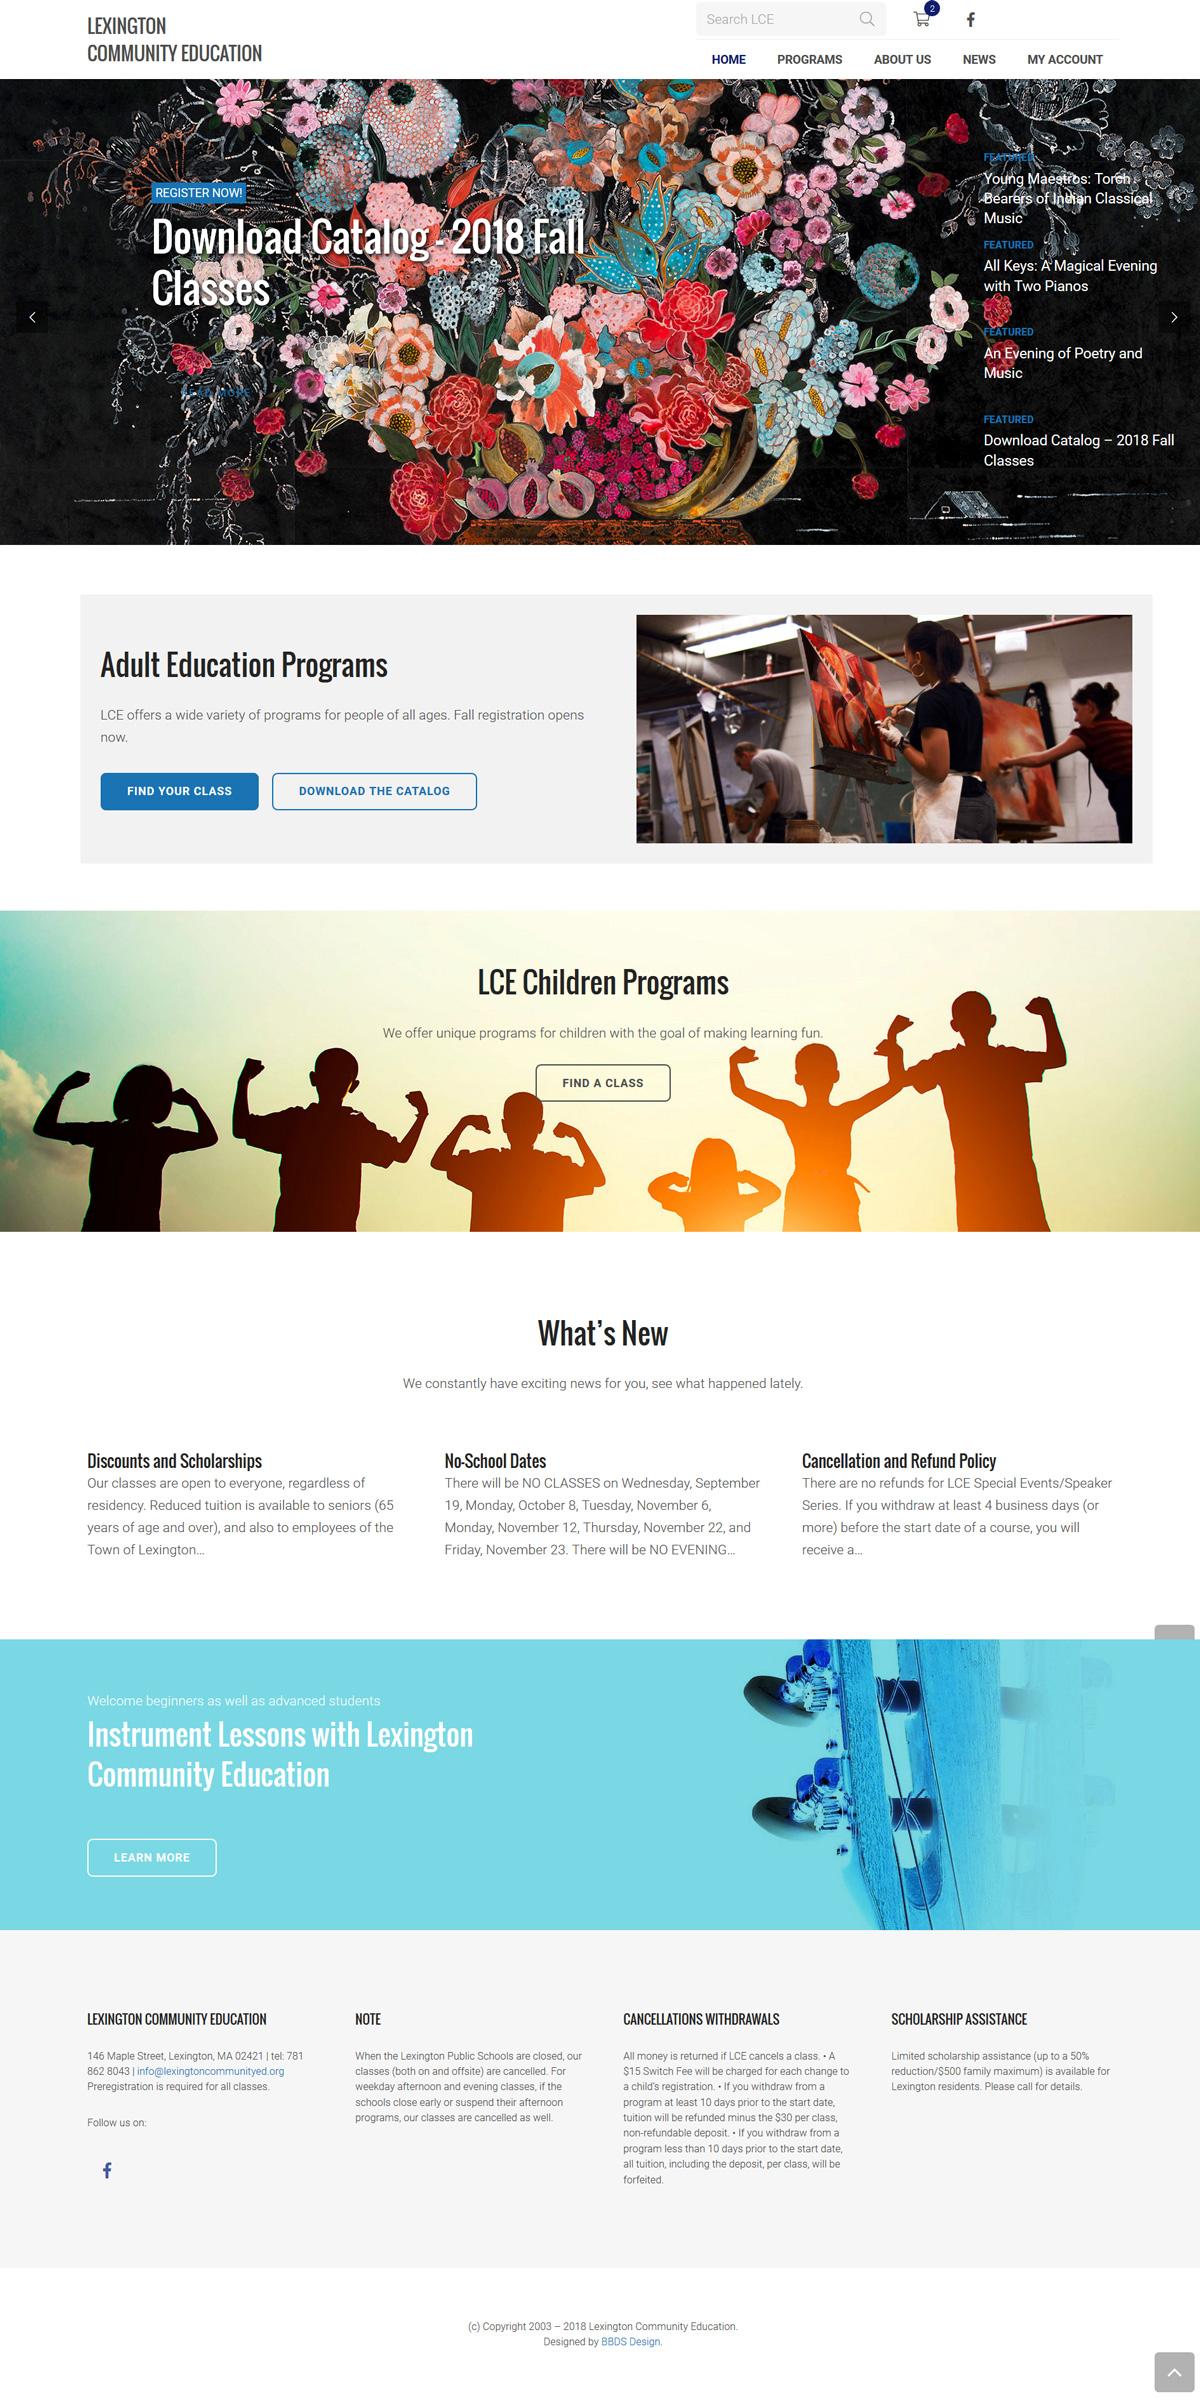 Lexington Community Education new website